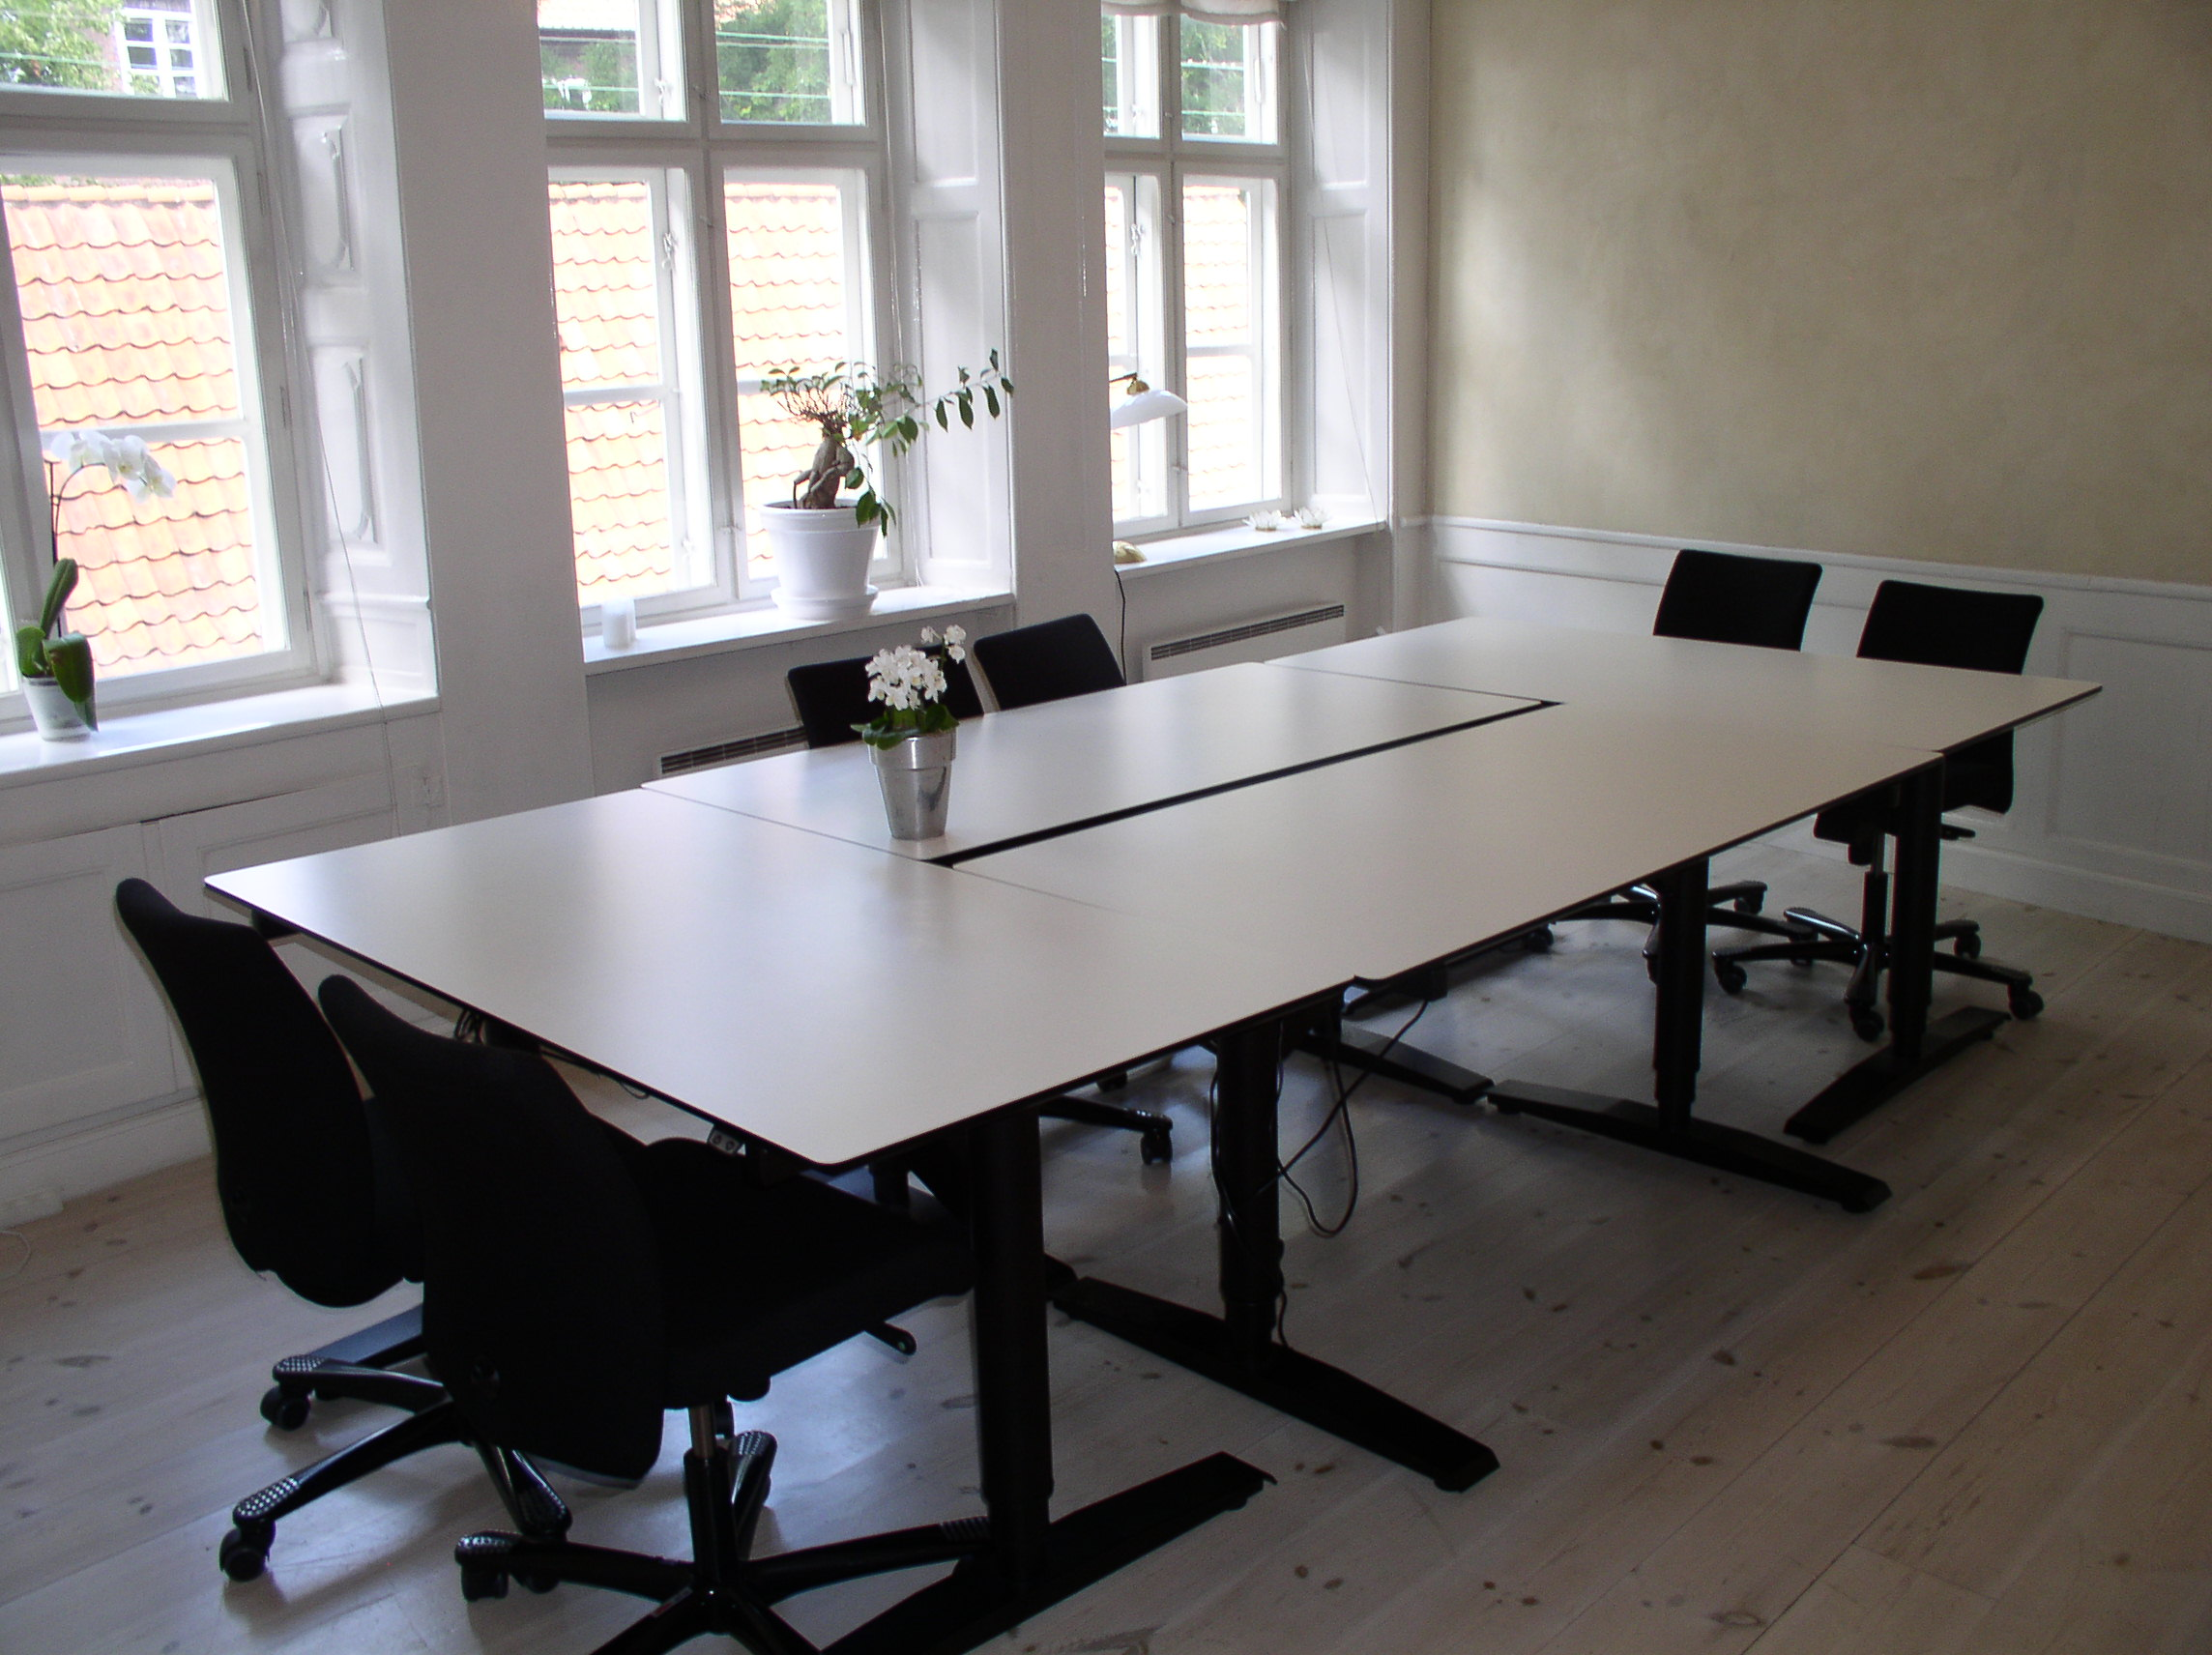 Mødelokale Kbh K 2-20 personer - Amino.dk